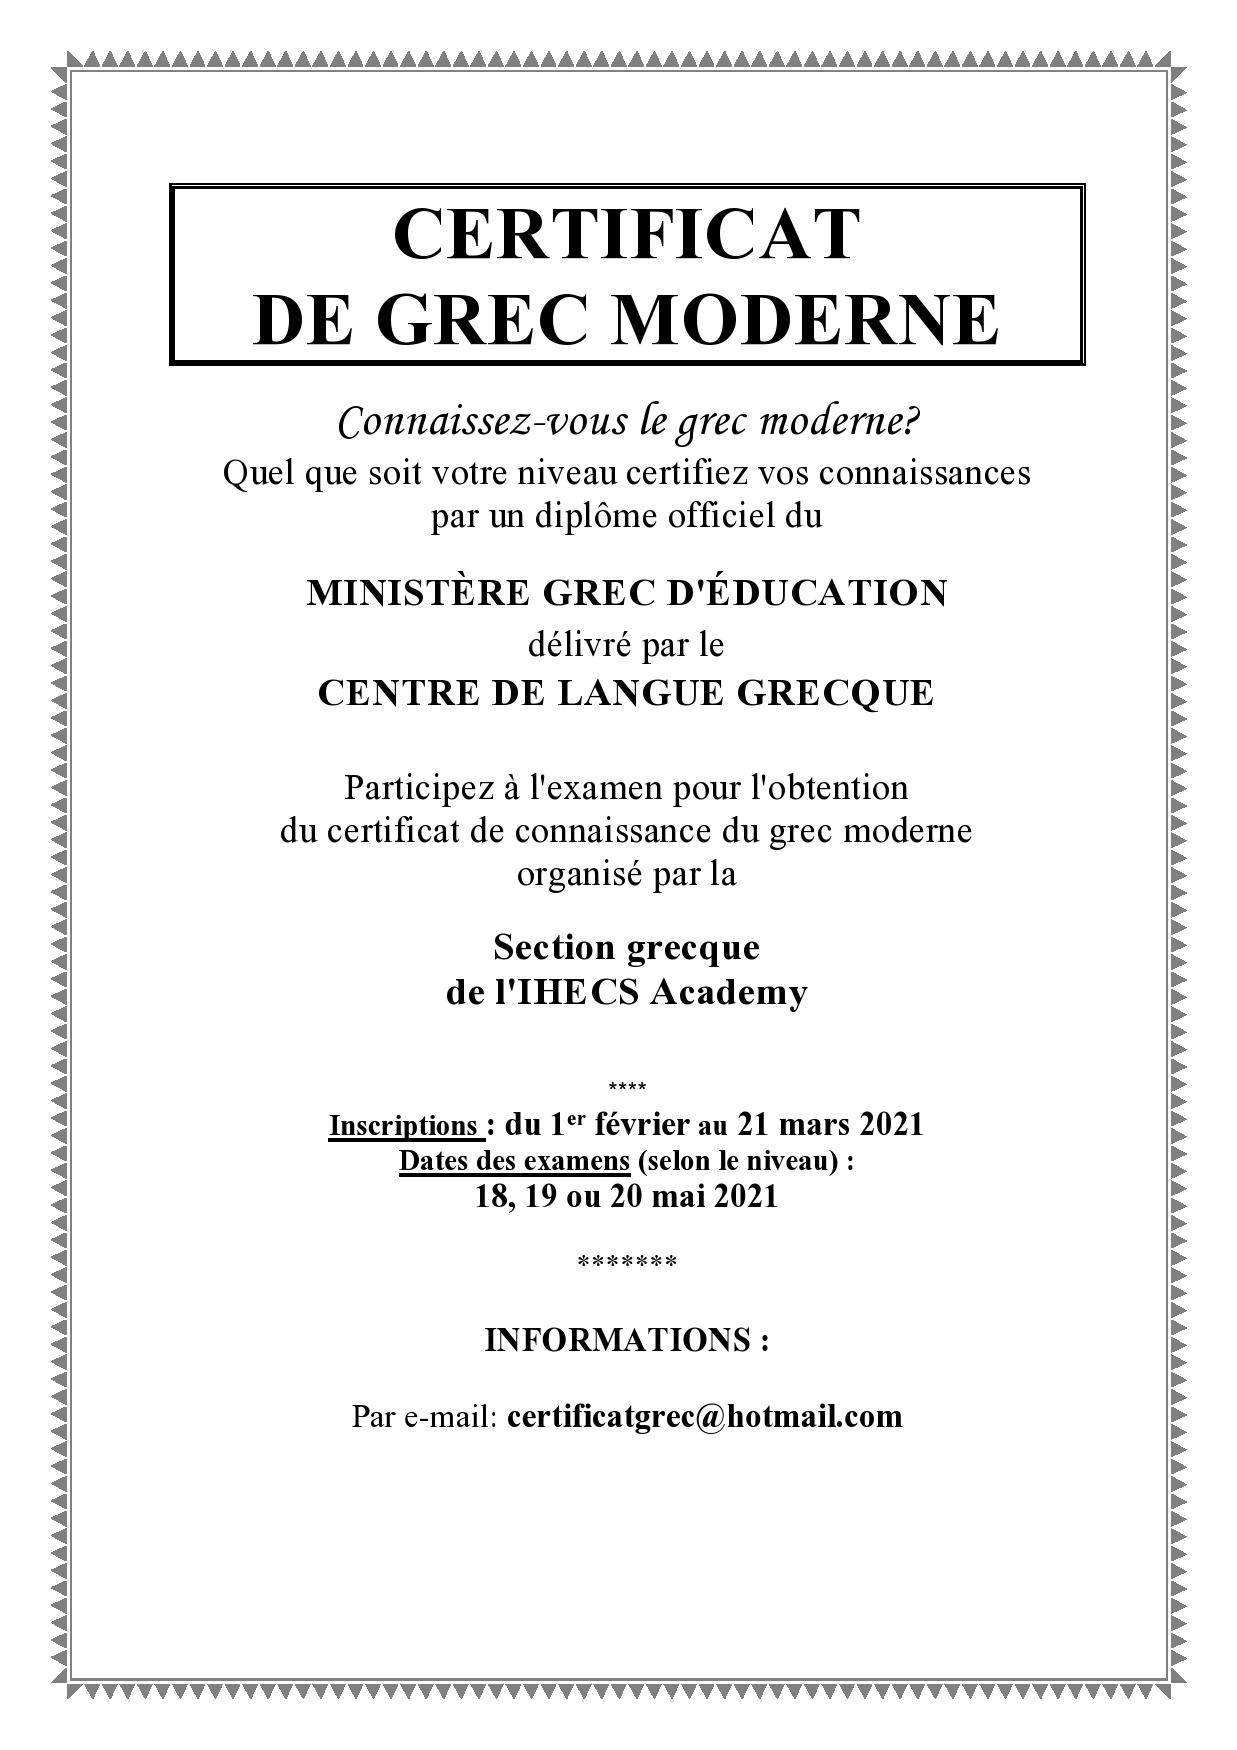 Afichette Certificat Grec 2021-page0002